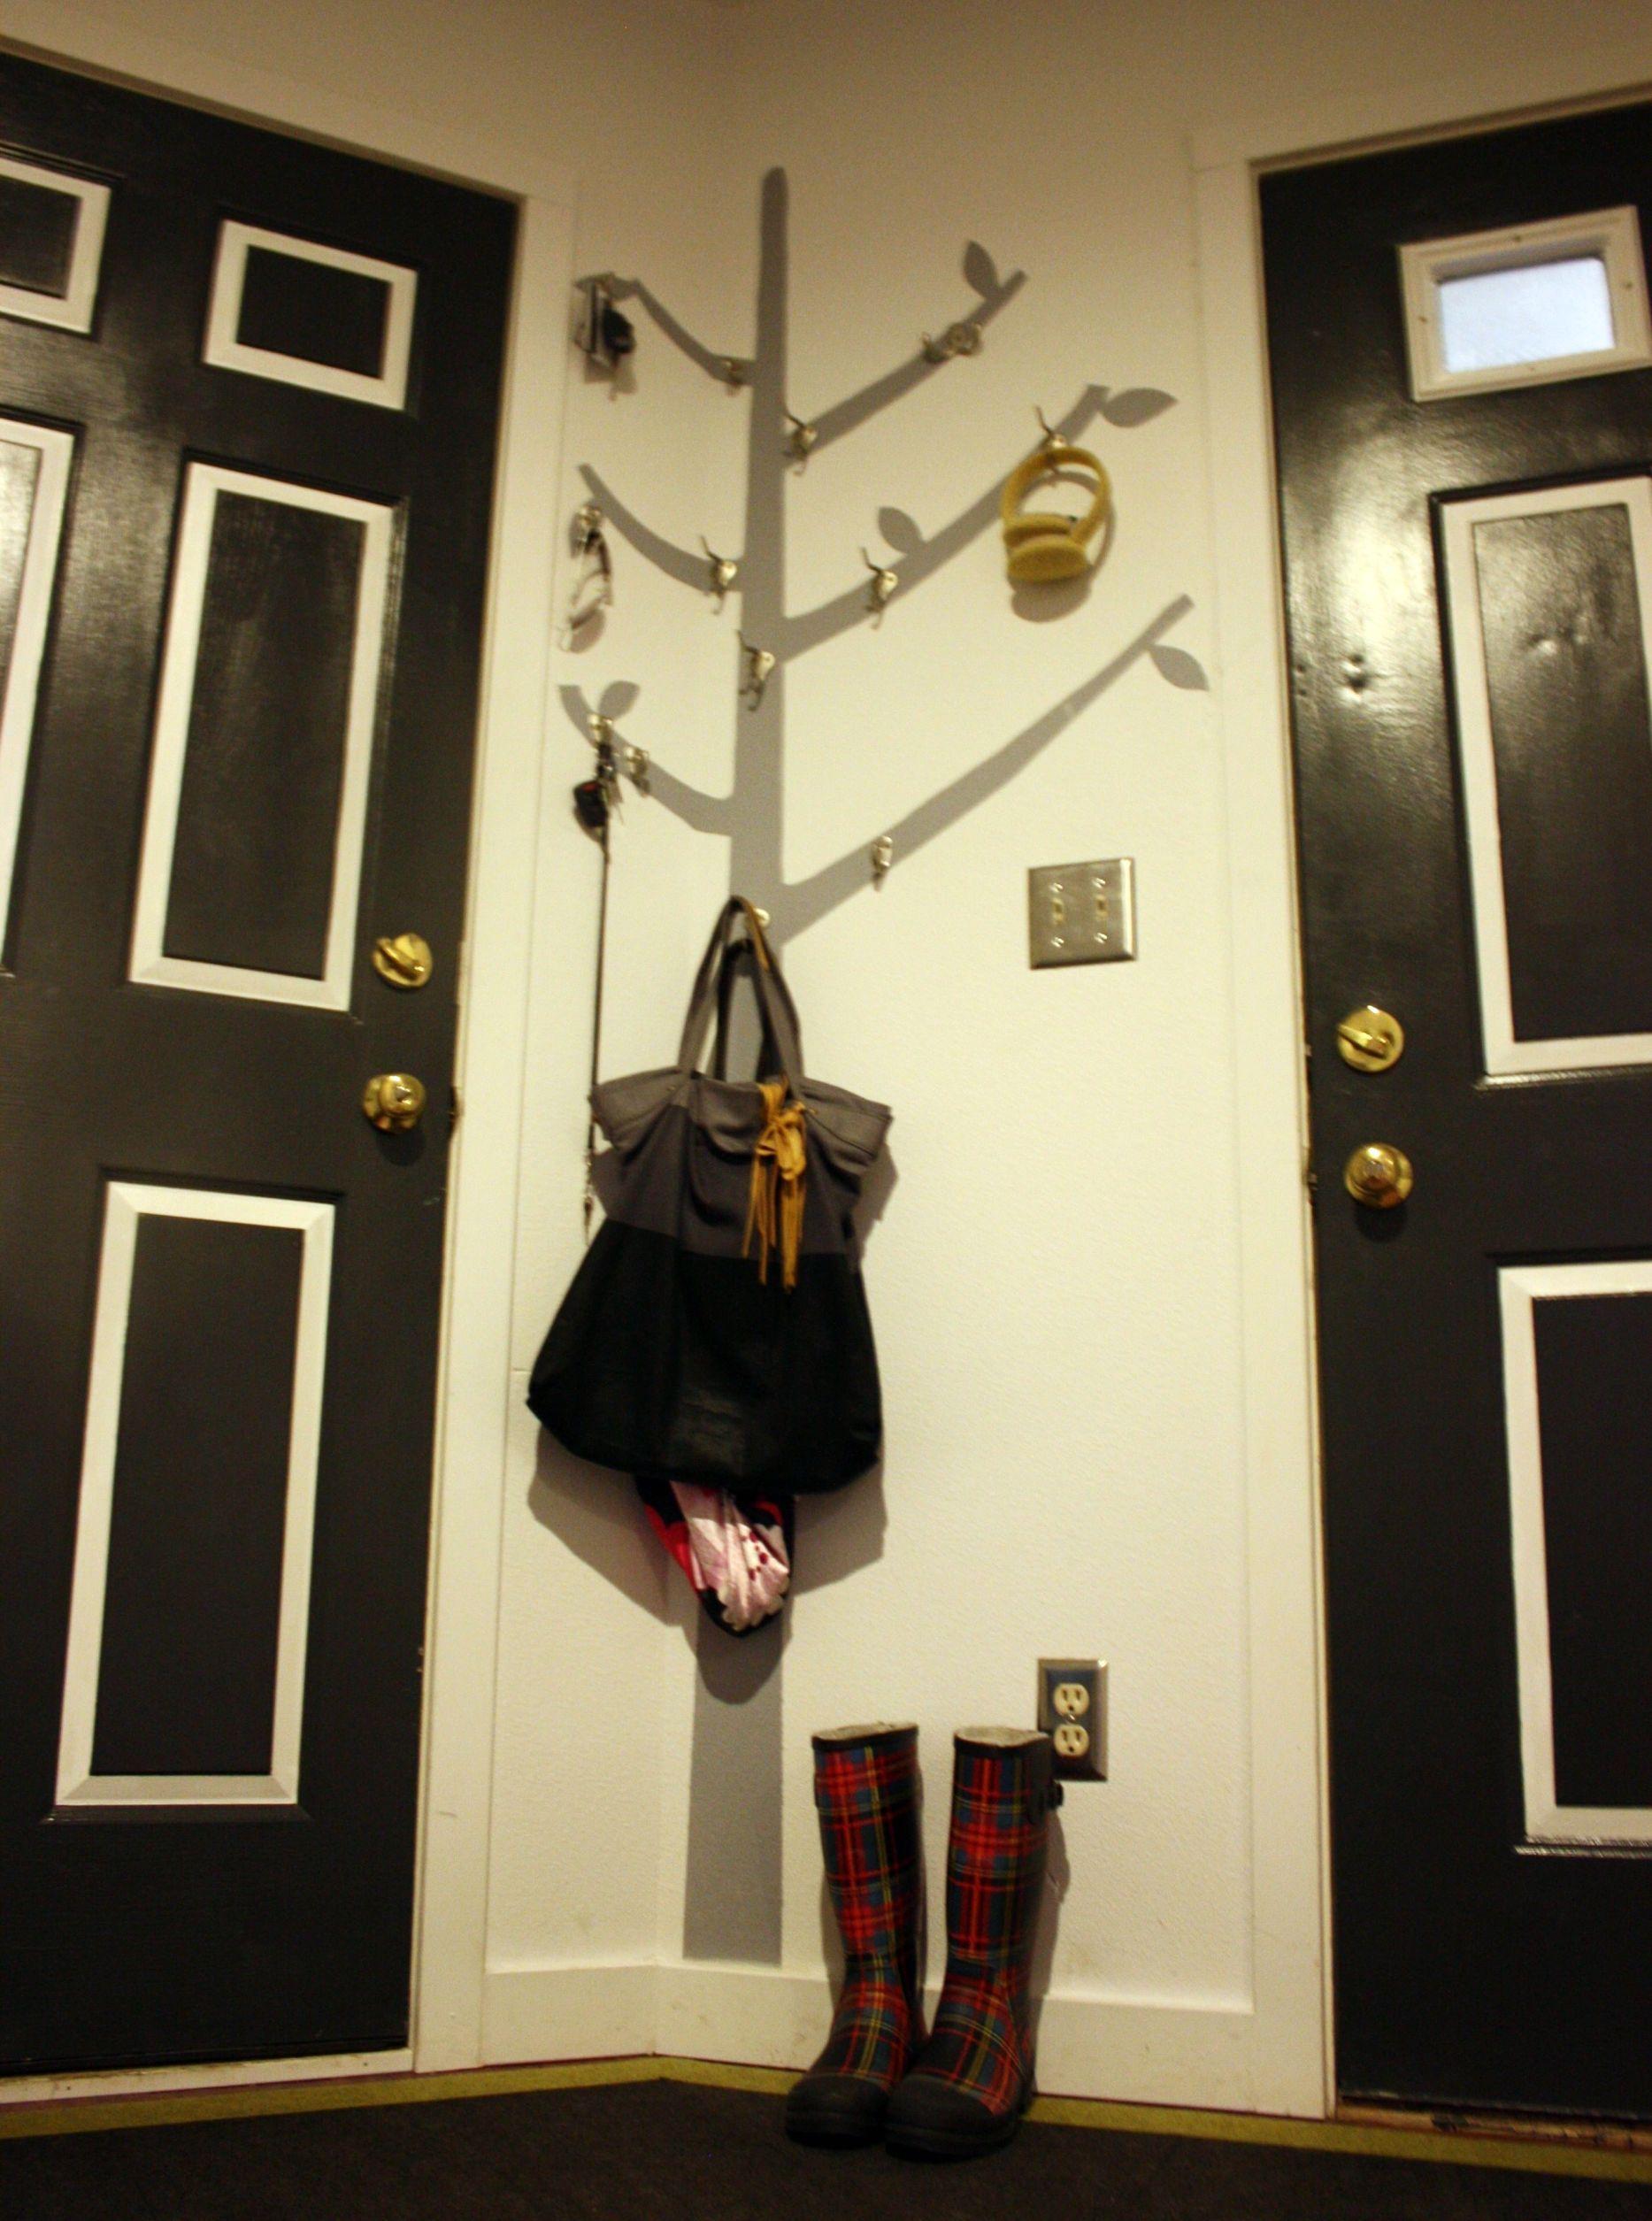 White Door Black Trim Black Door With White Trim And That Coat Tree So Cute 3